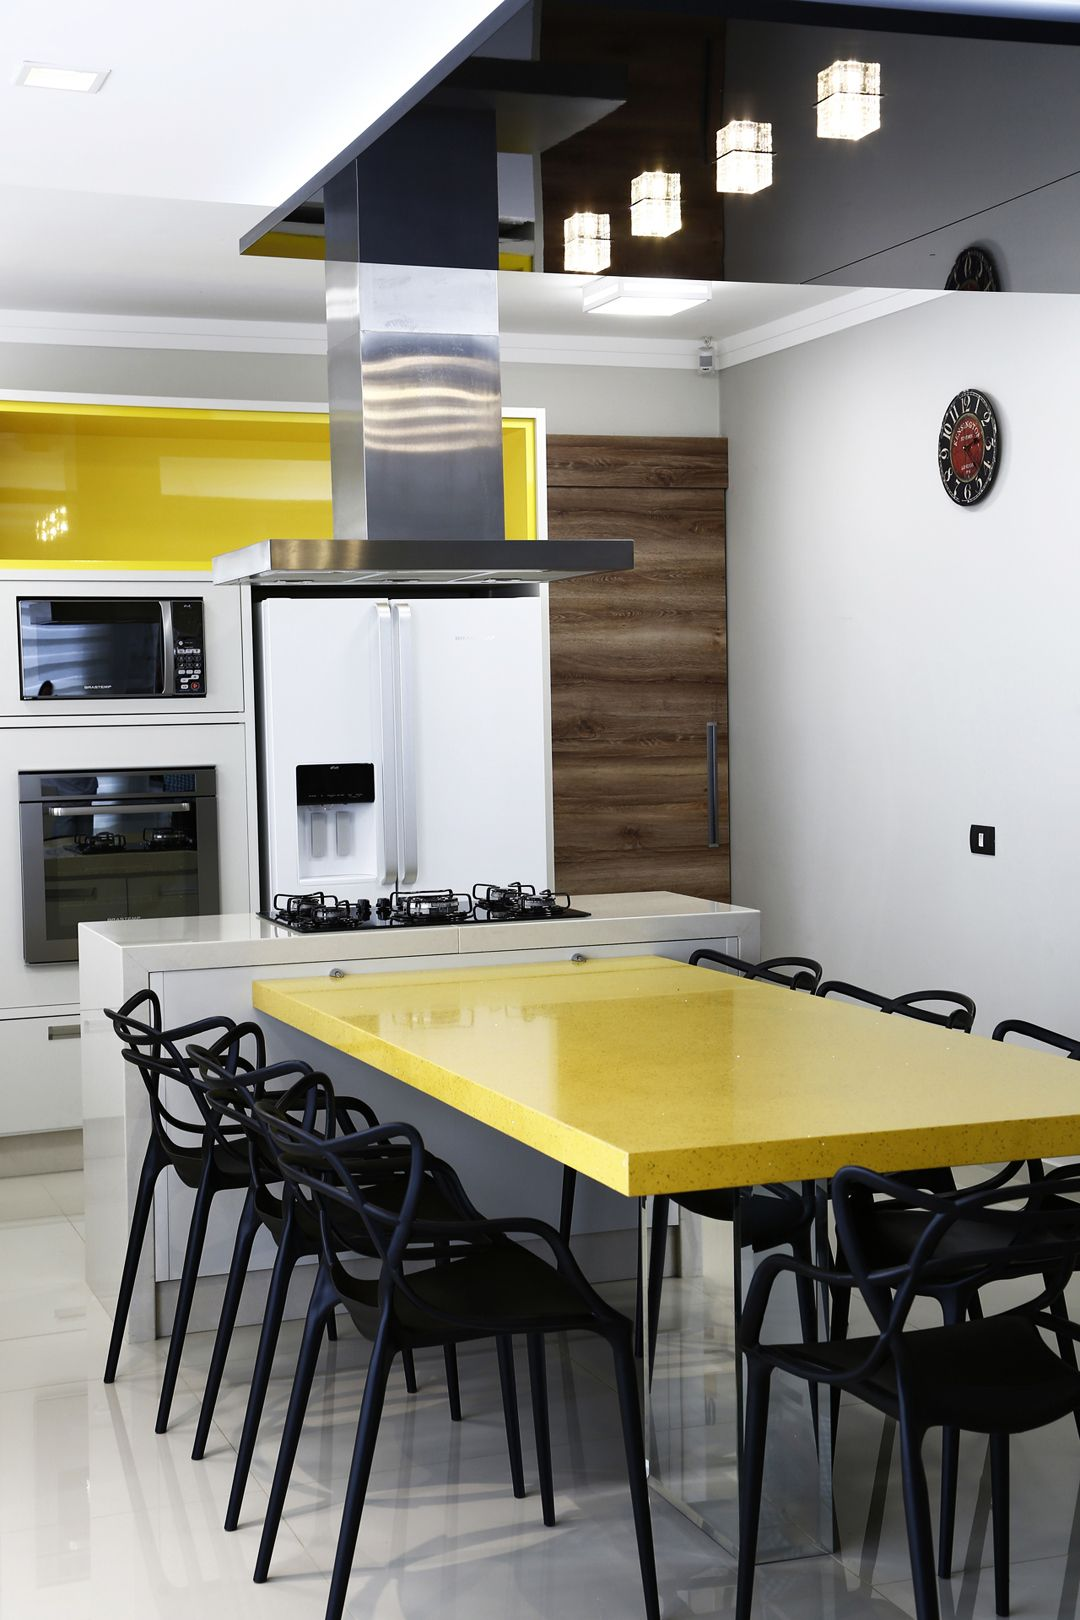 Cozinha kashmir nicho citrino mesa silestone amarelo - Mesas de silestone ...